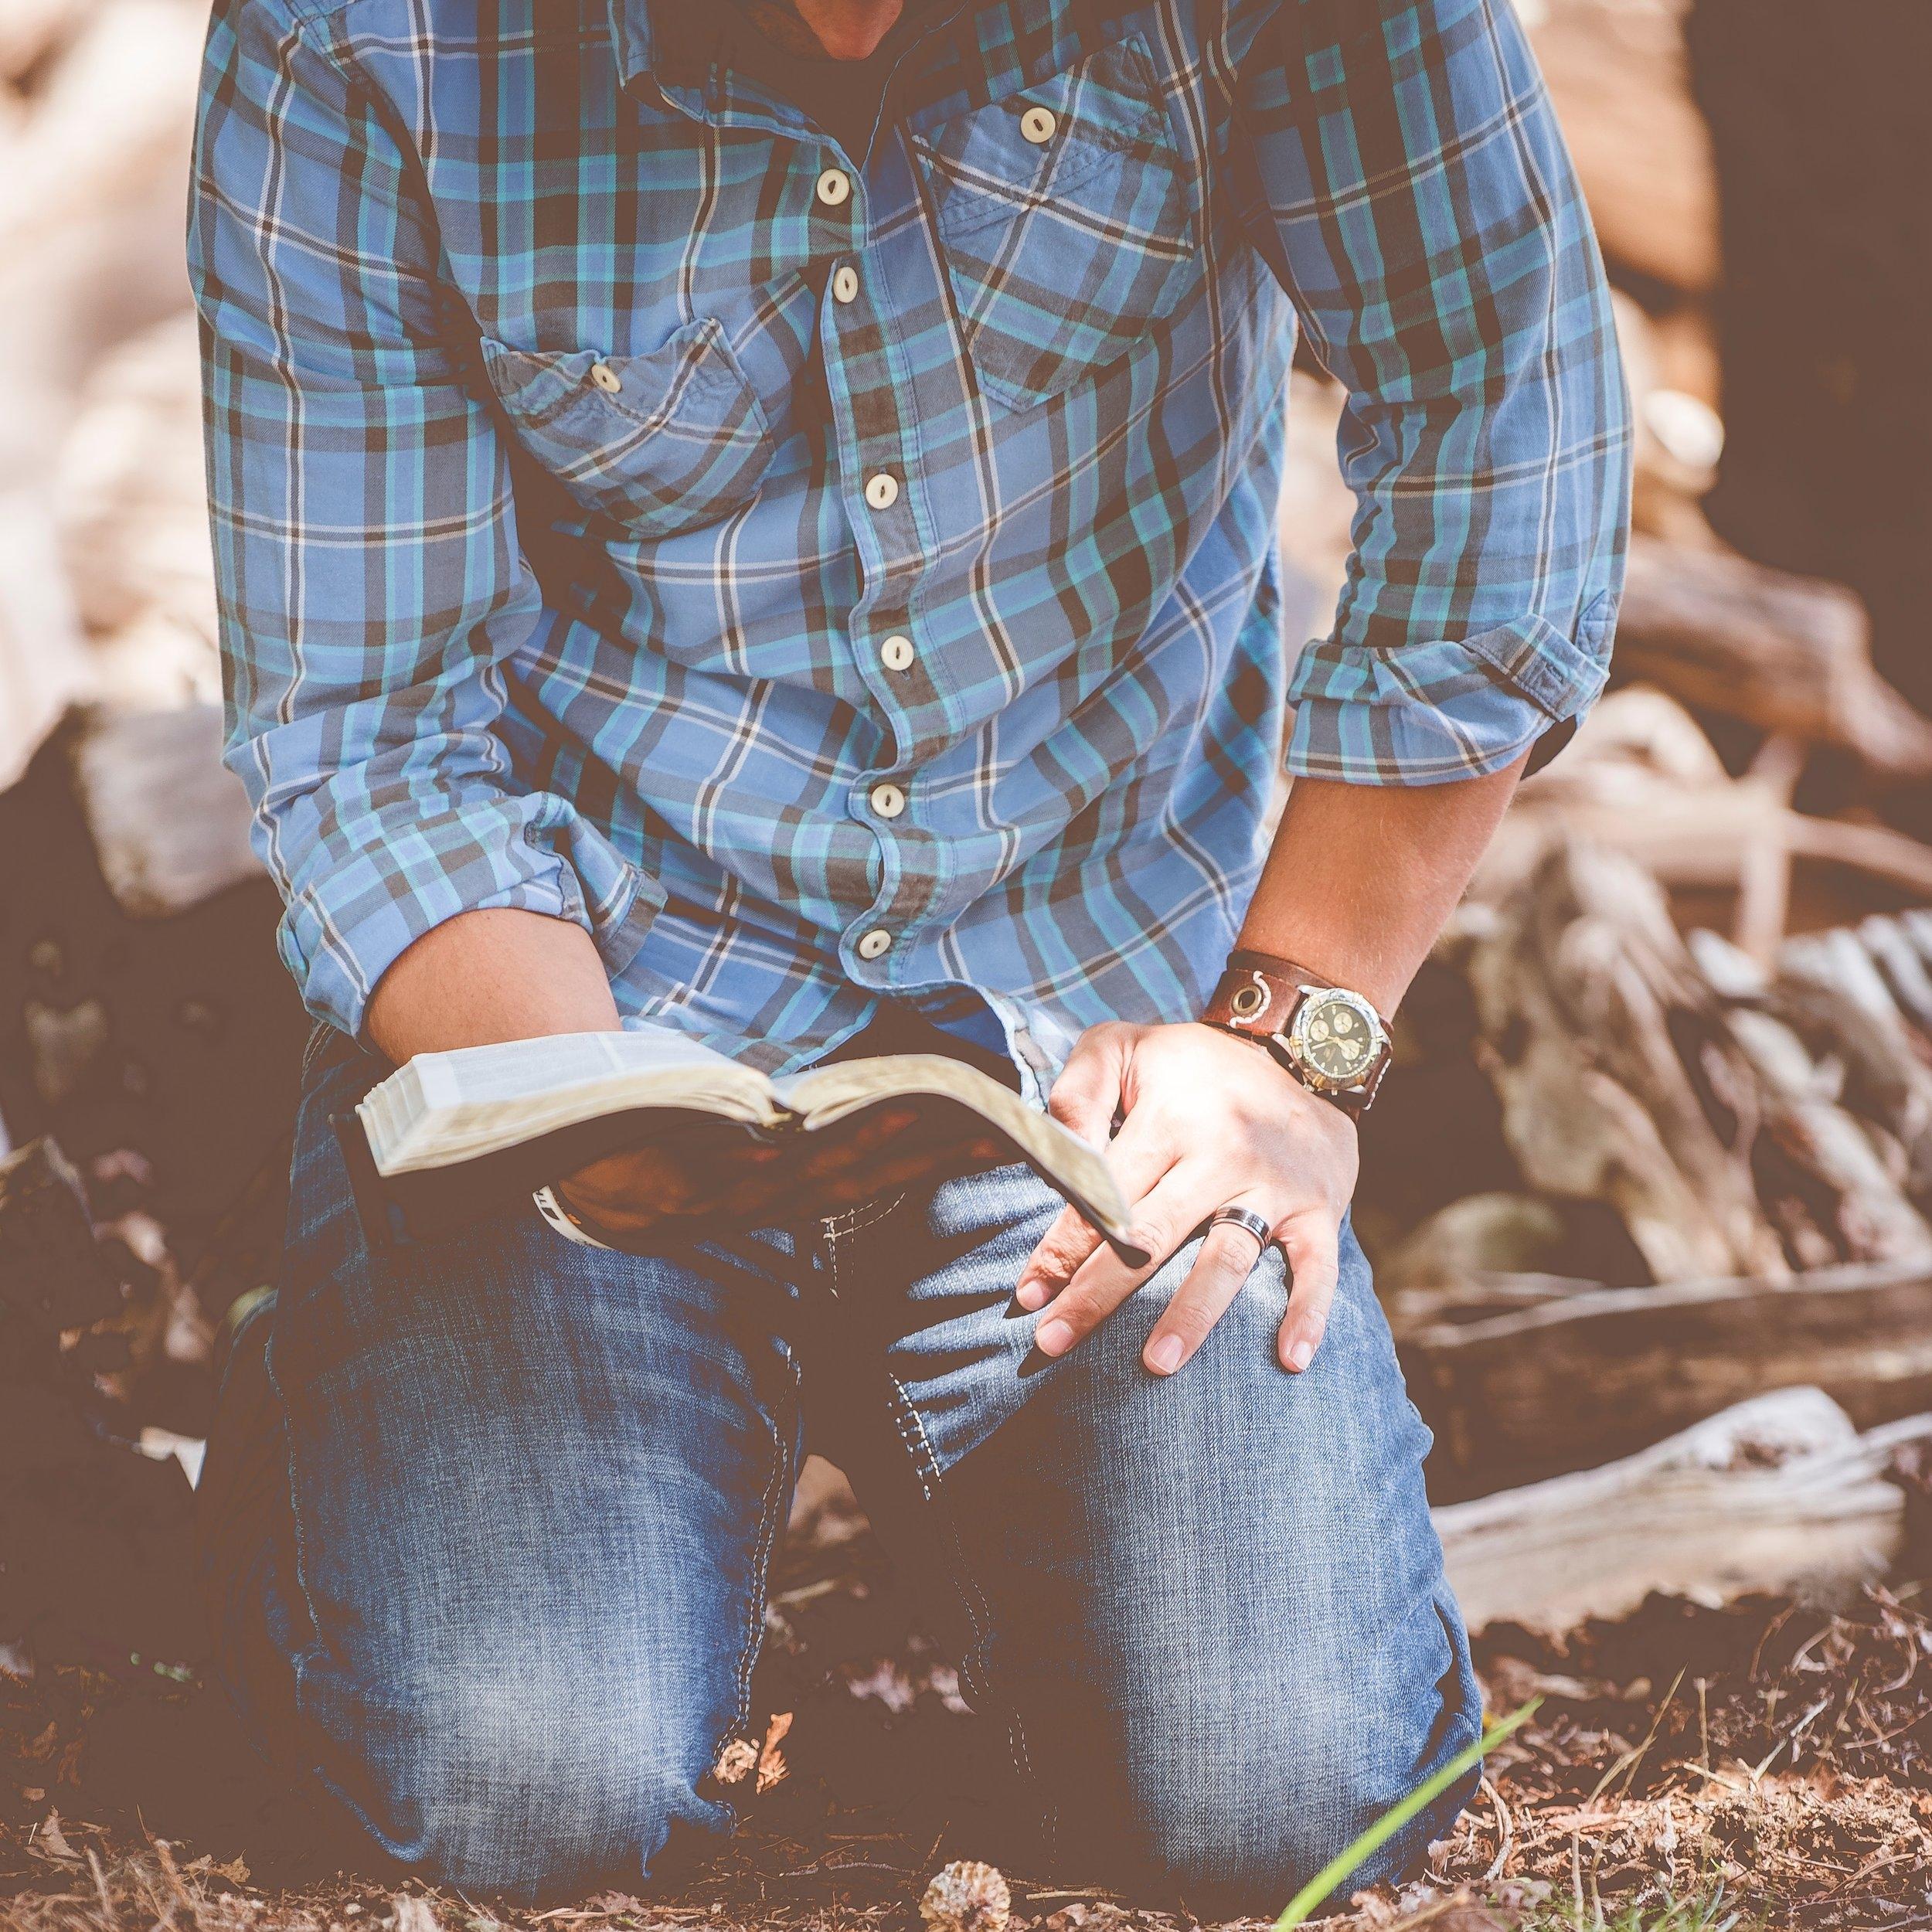 new bern bible school